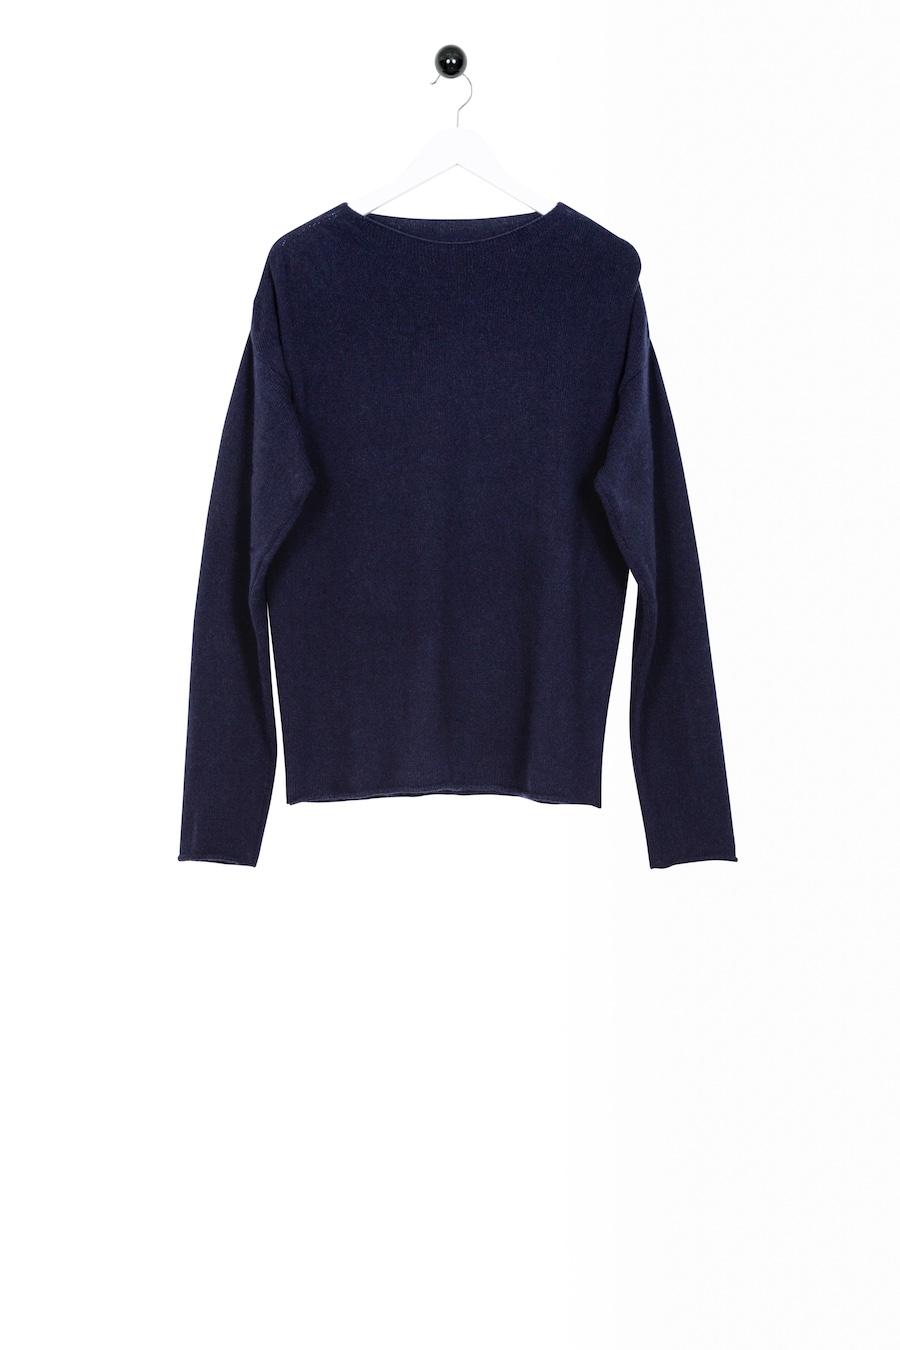 Arnish Sweater